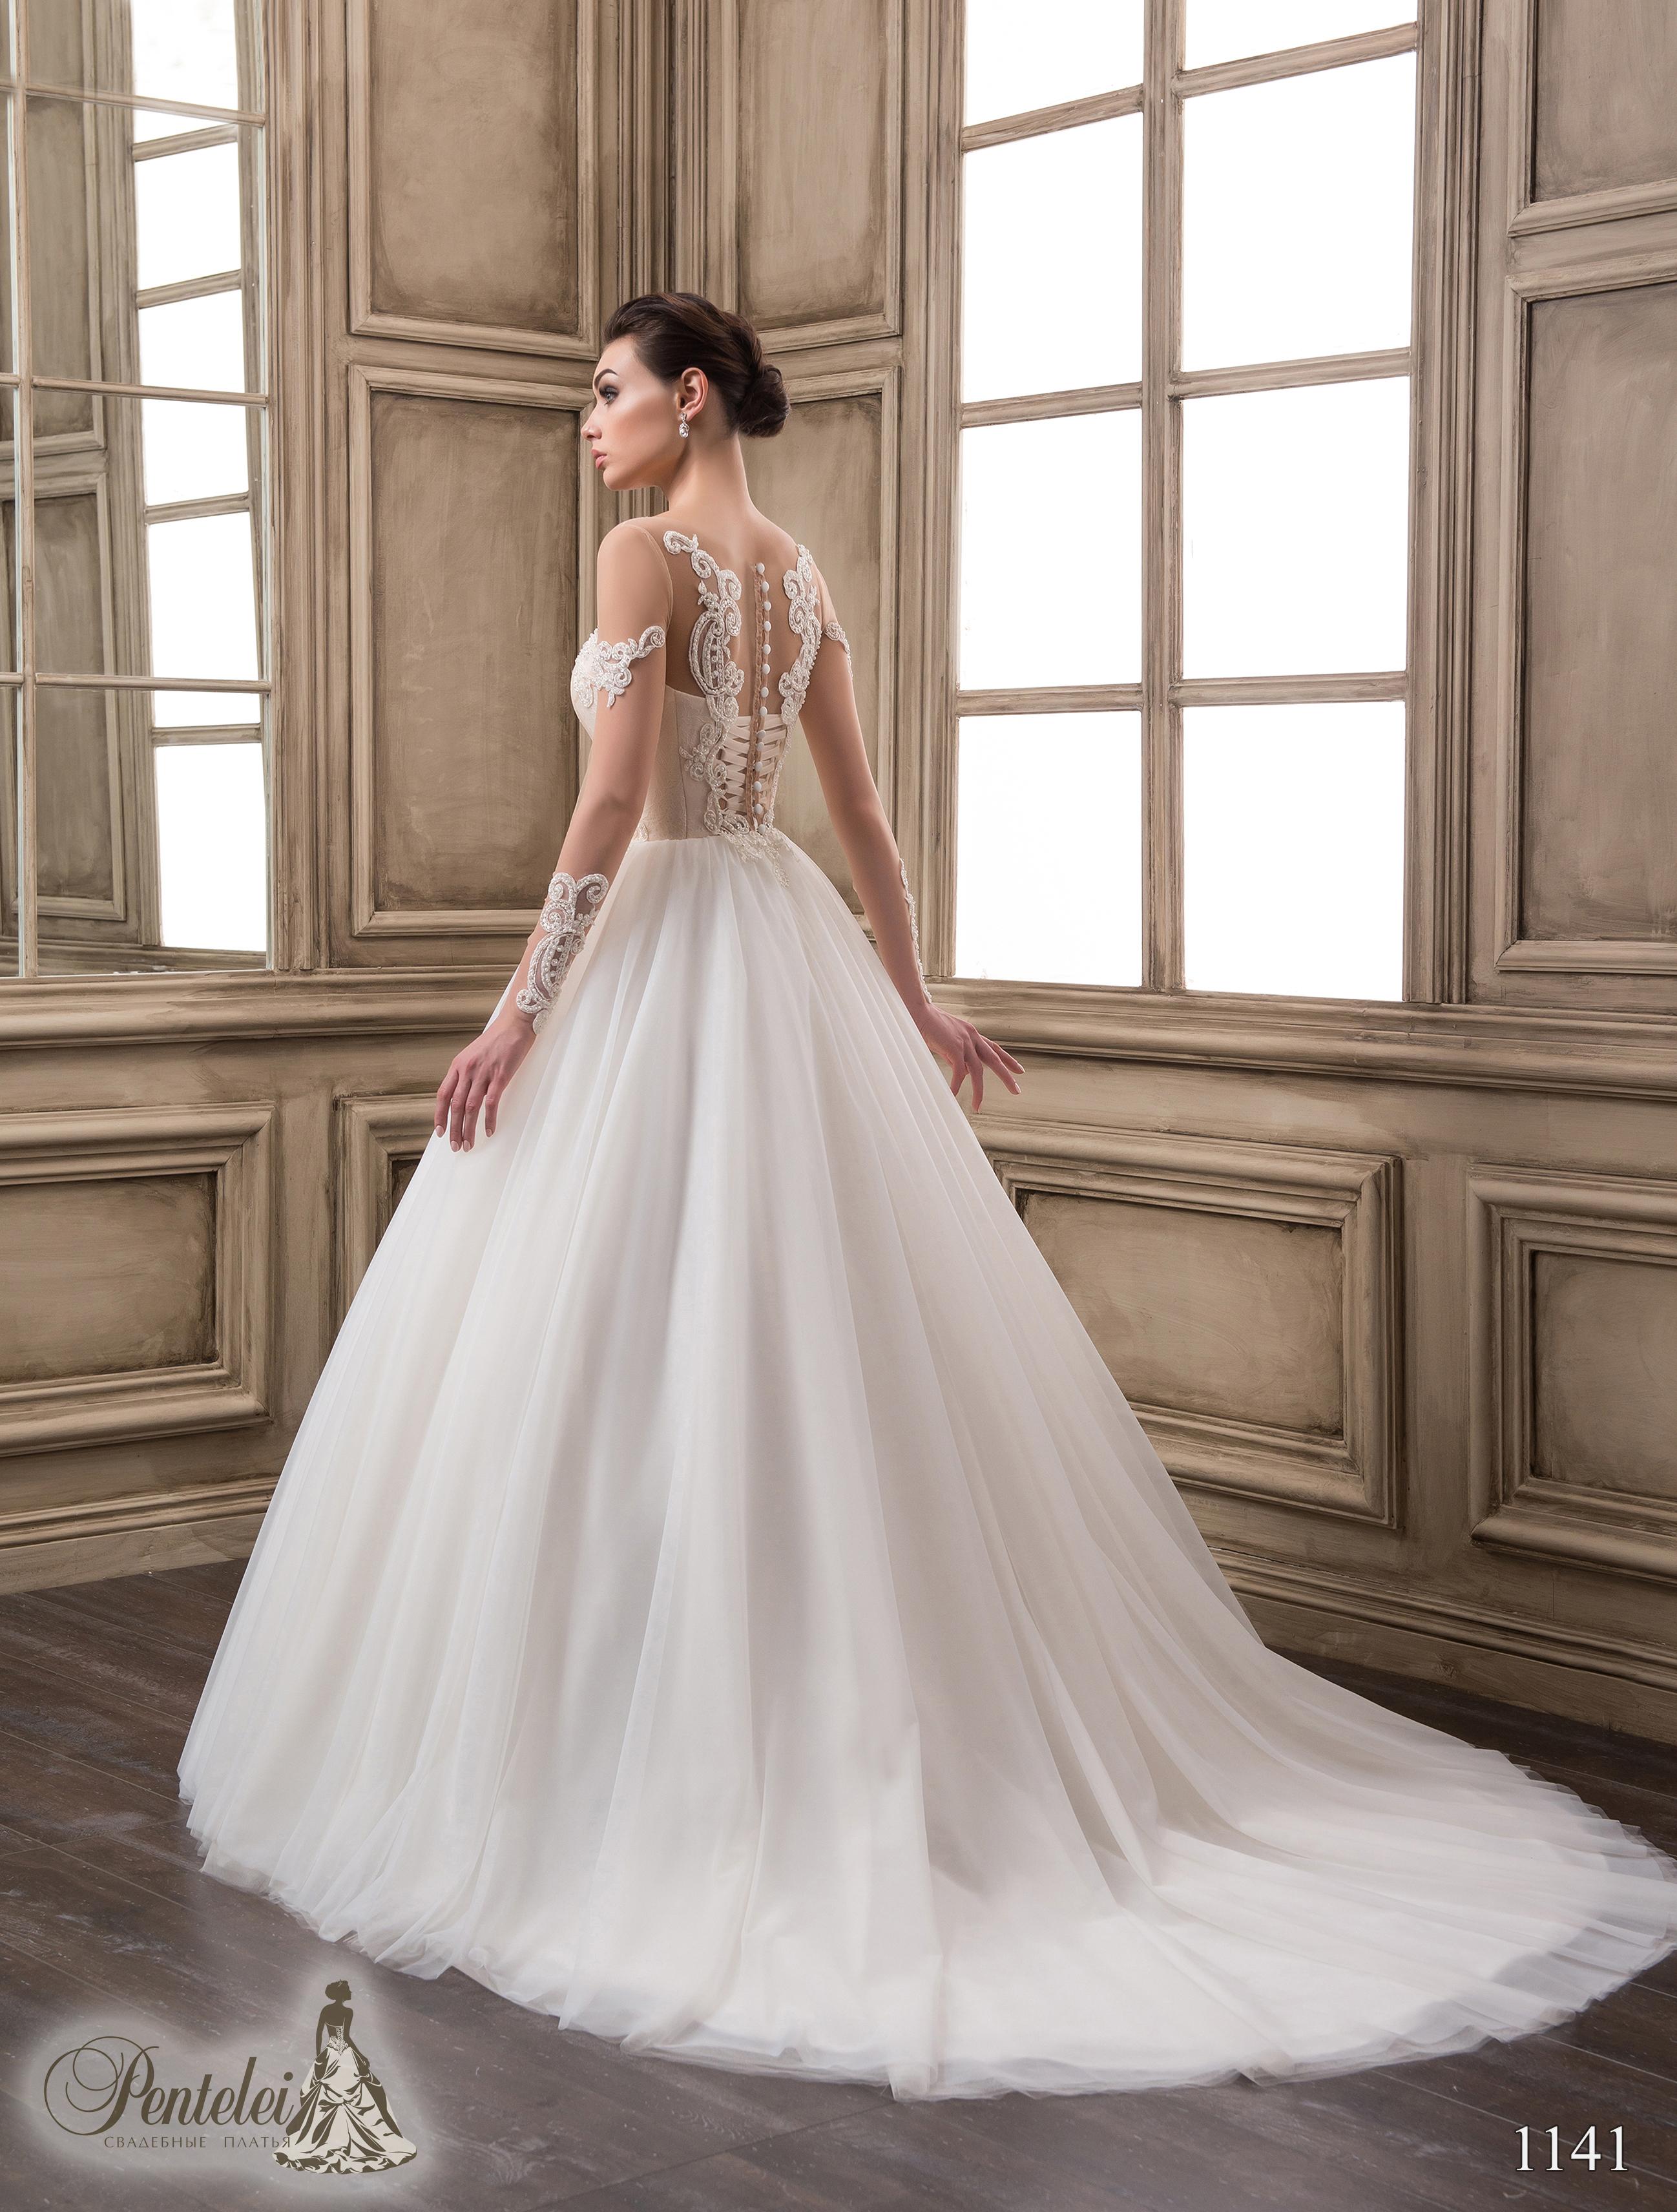 1141 | Buy wedding dresses wholesale from Pentelei